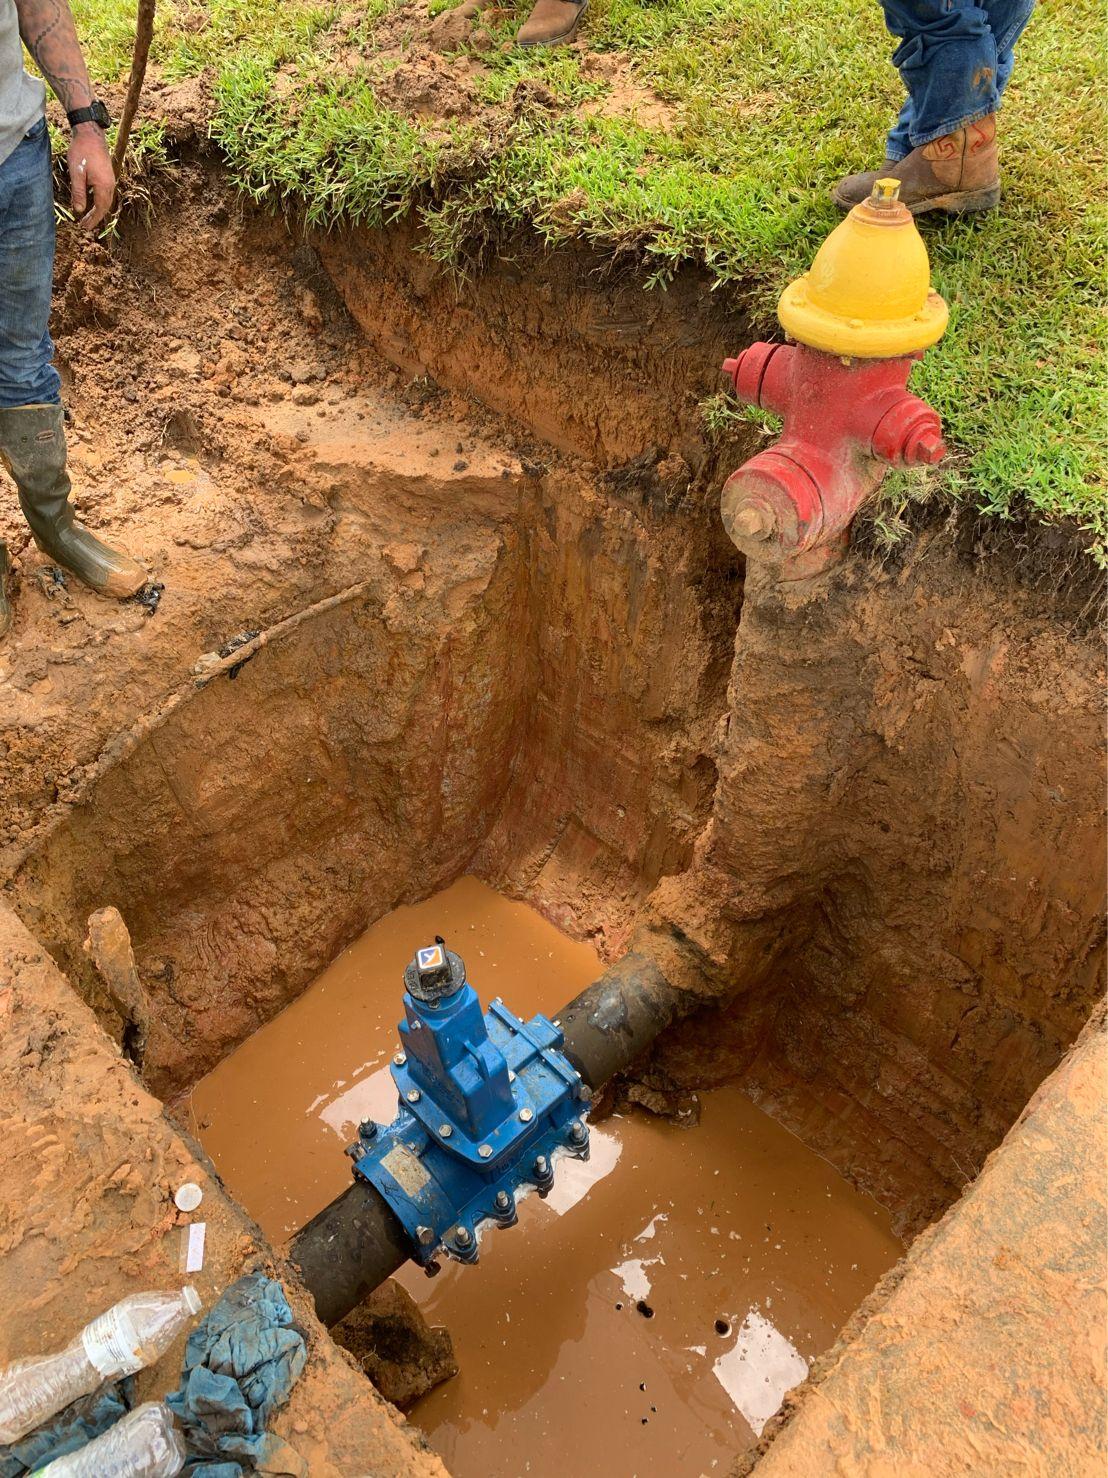 AVT EZ Valve isolates fire hydrant